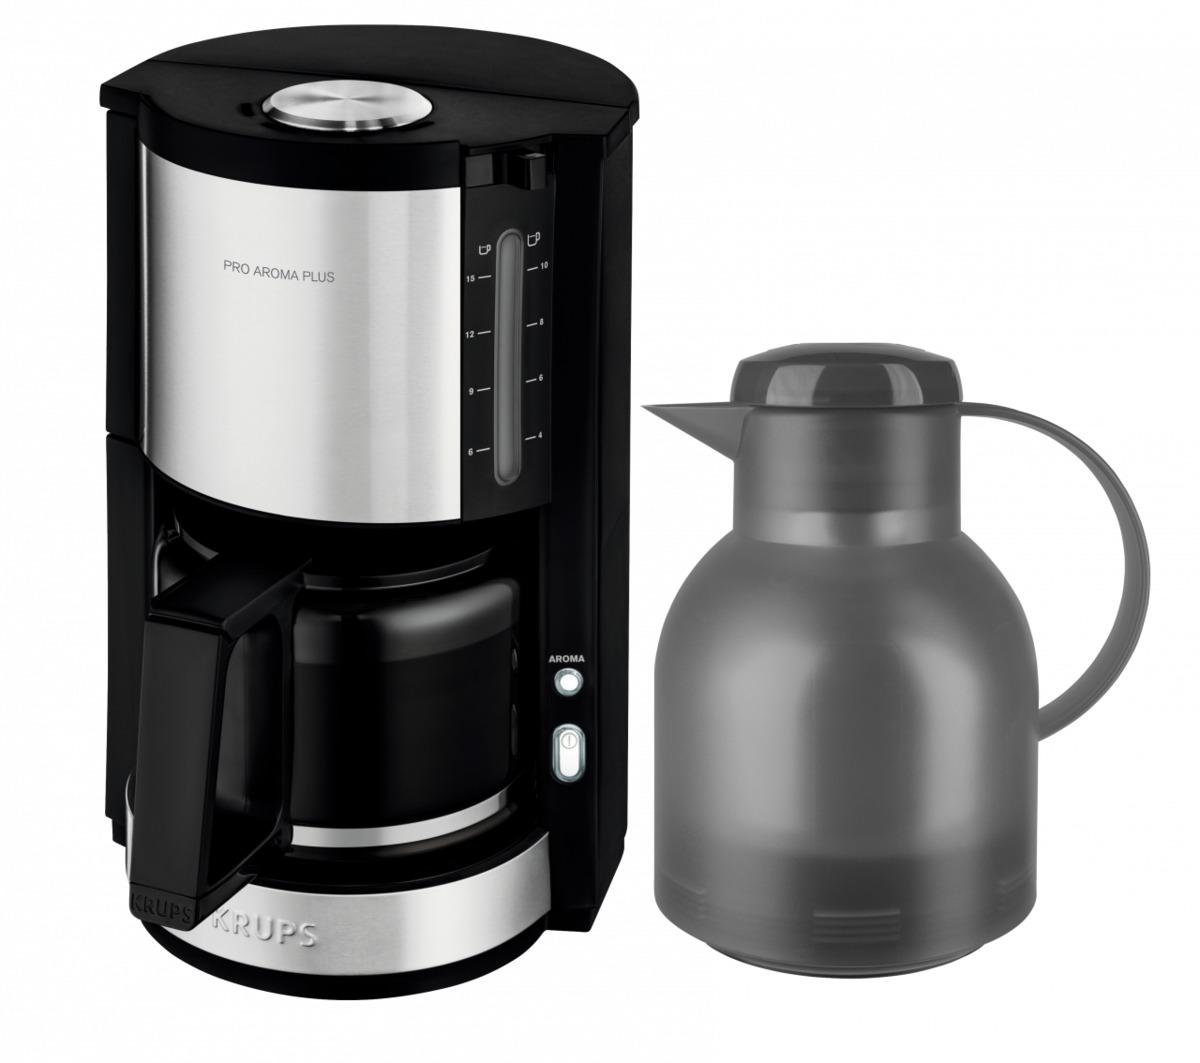 Bild 1 von Krups Kaffeemaschine ProAroma Plus KM3210 inkl. Emsa-Kanne (grau)